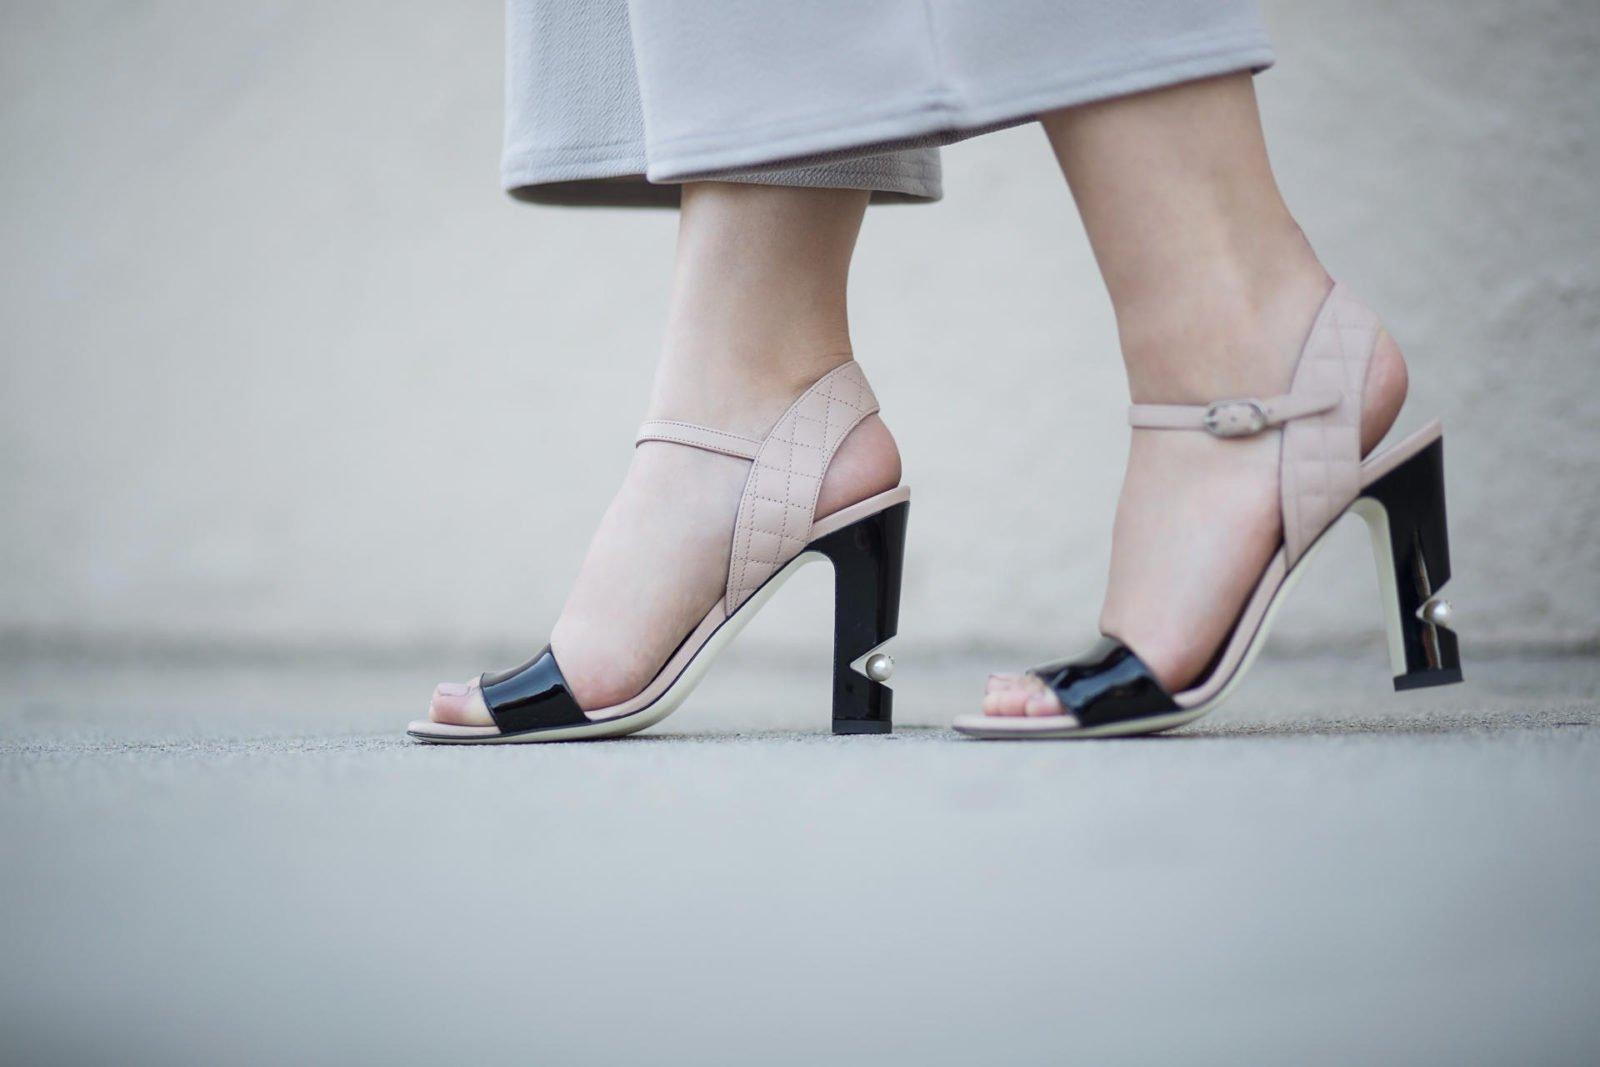 serein-wu-chanel-heels